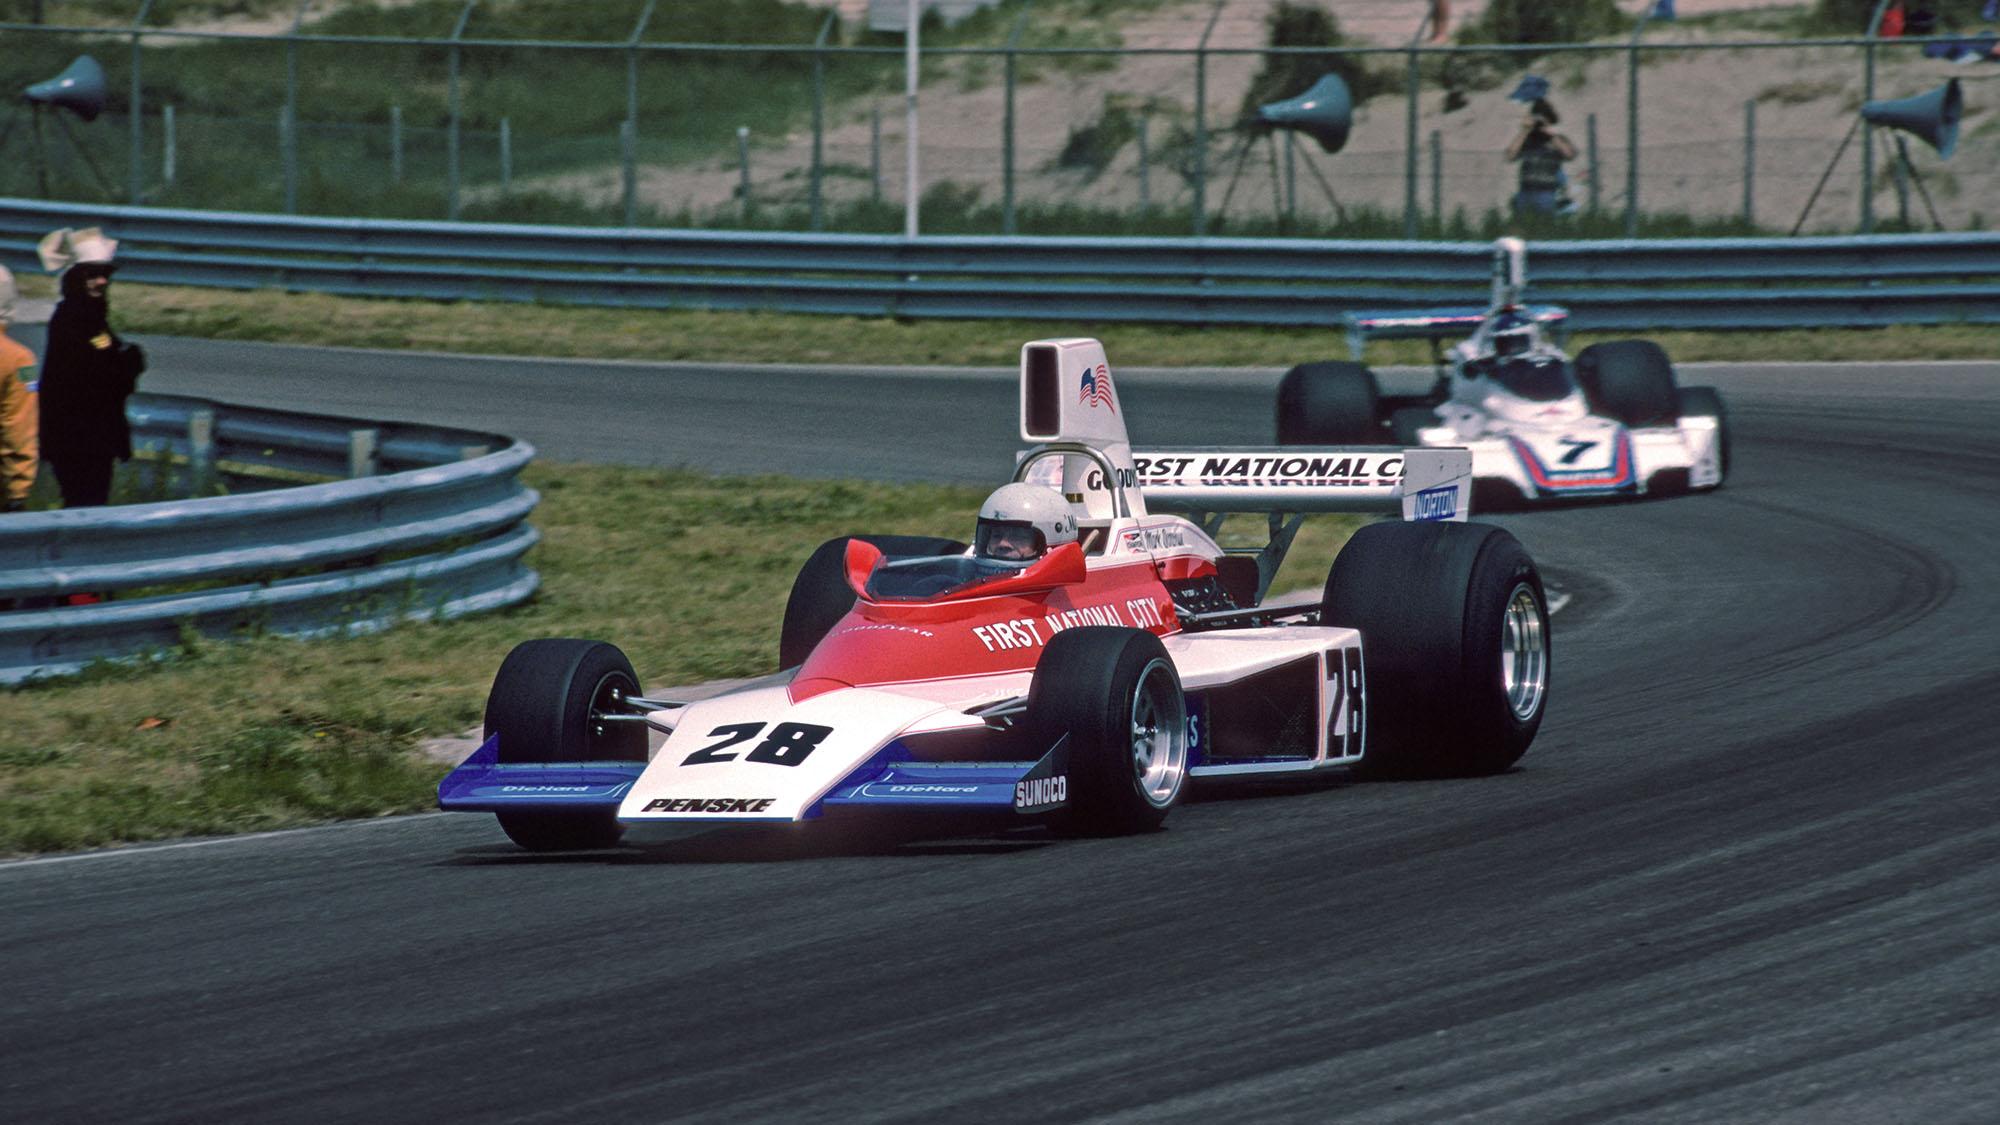 Mark Donohue (Penske-Ford) leads Carlos Reutemann (Brabham-Ford) in the 1975 Dutch Grand Prix in Zandvoort. Photo: Grand Prix Photo